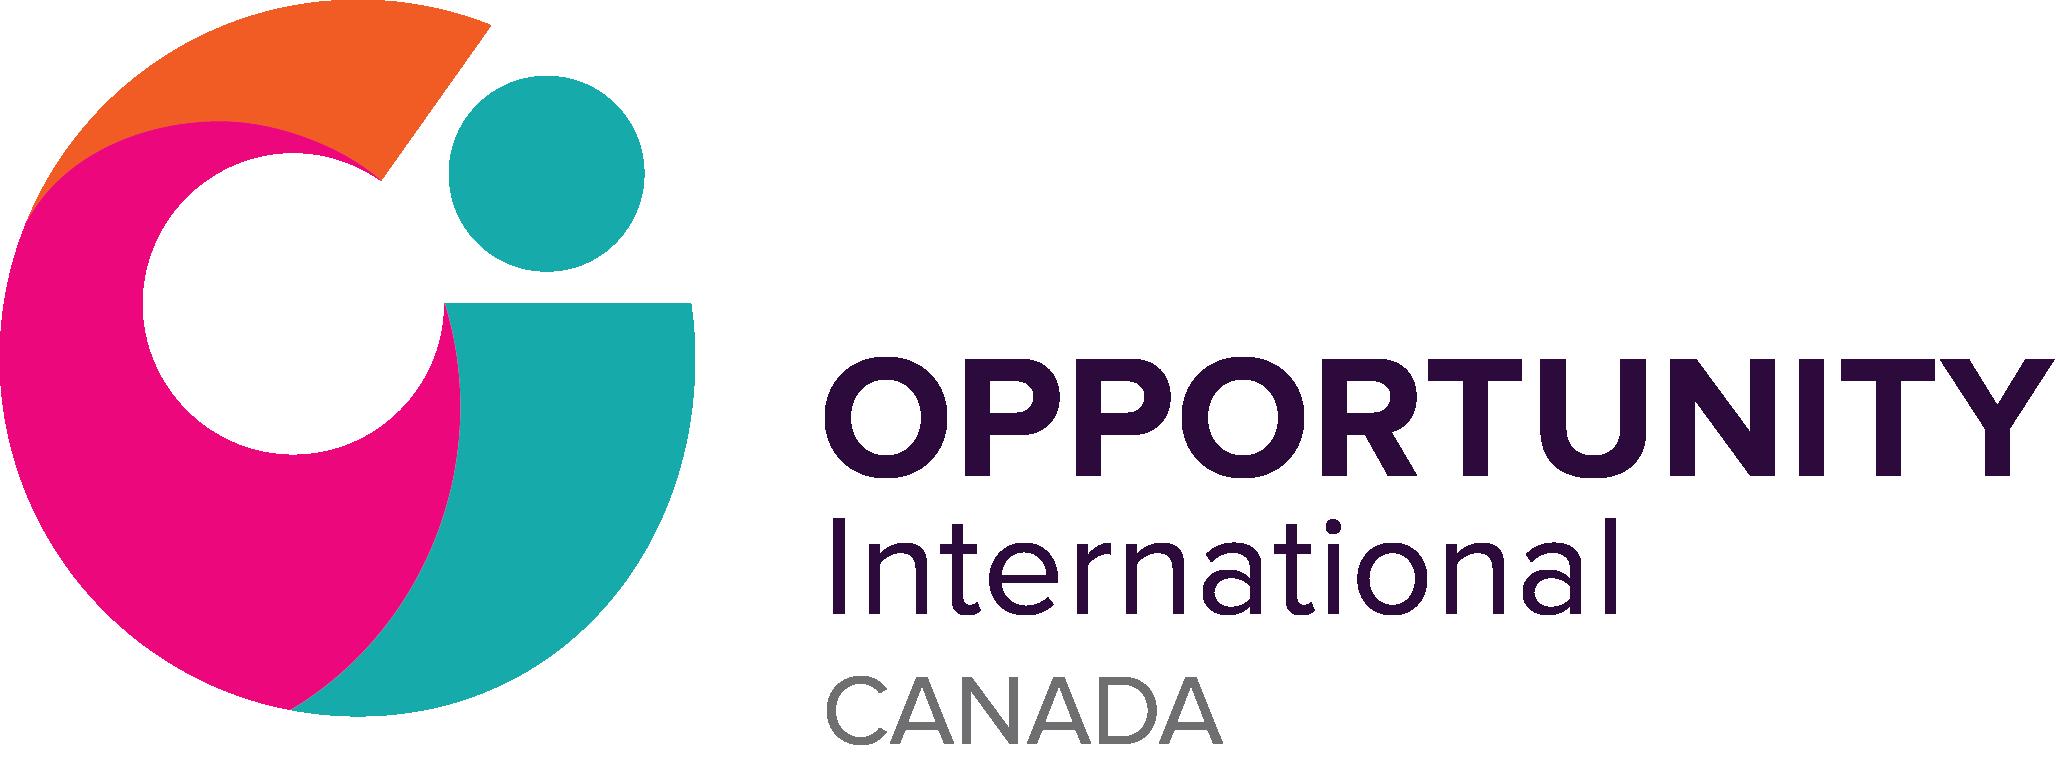 Opportunity International Canada